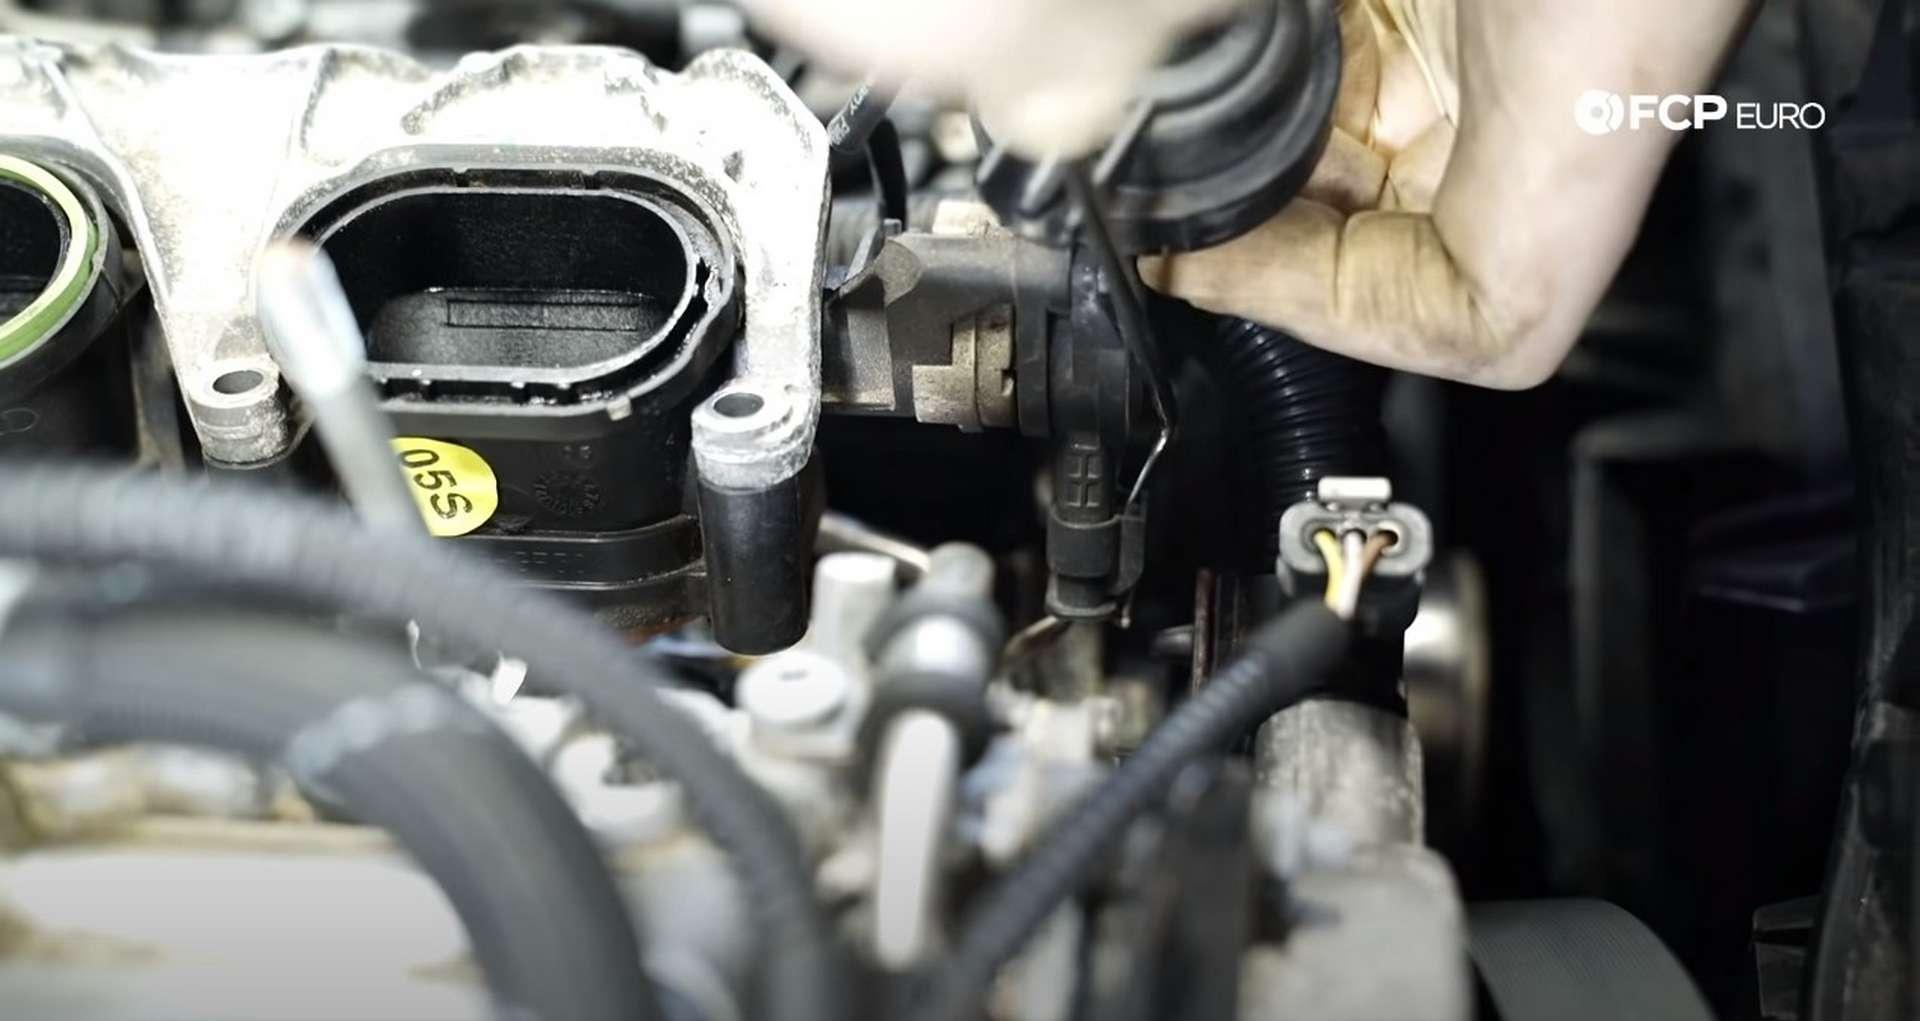 DIY Audi 3.0t Walnut Blasting Intake Valves disconnecting the manifold sensor